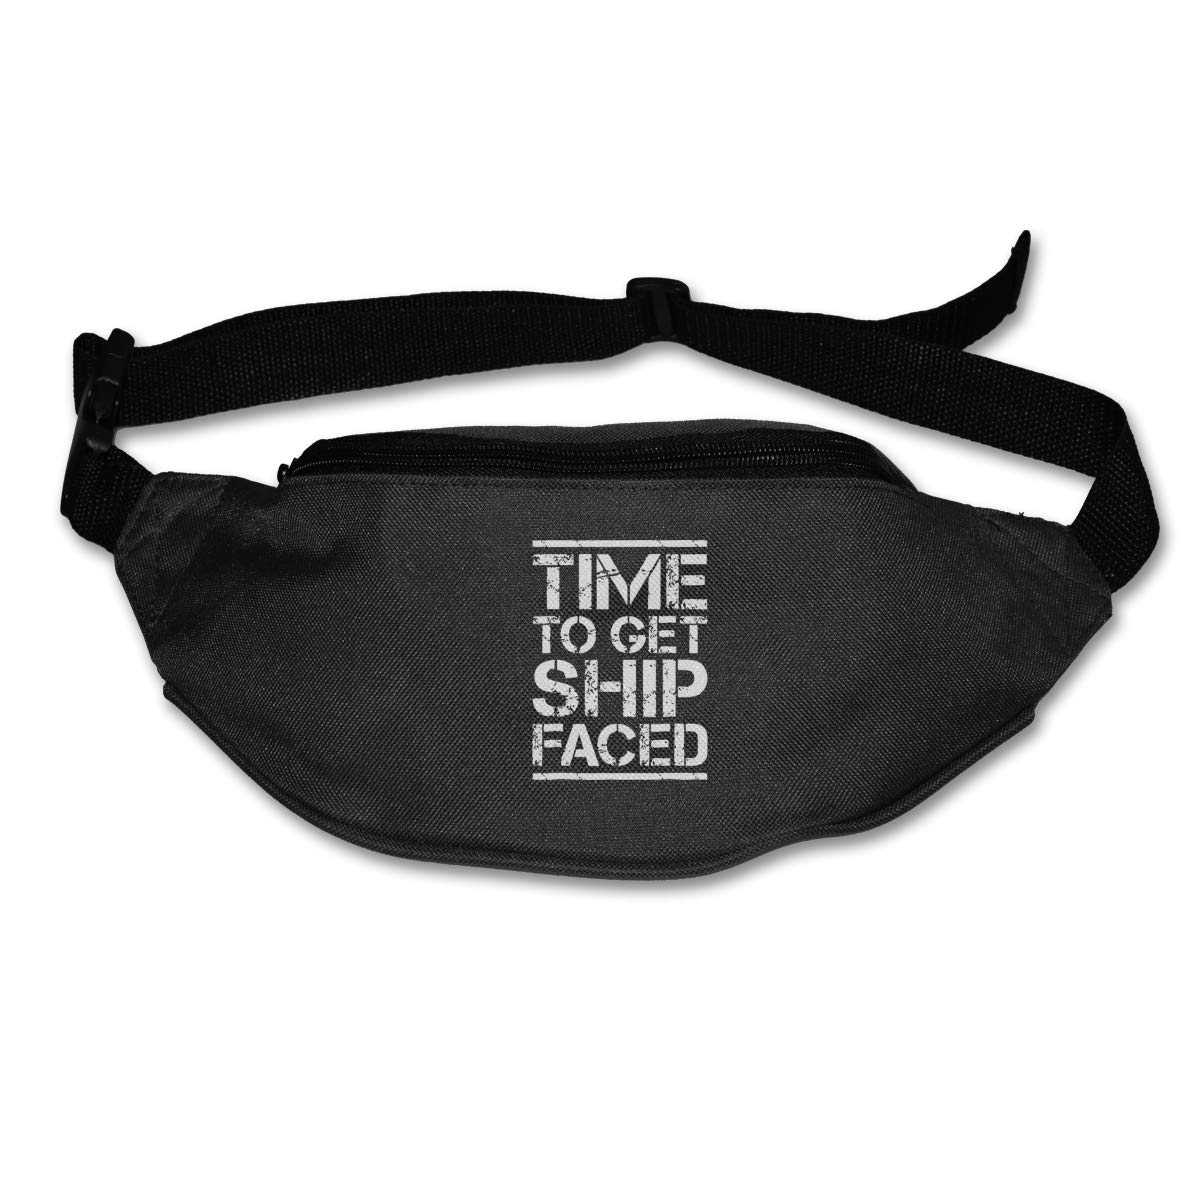 Time To Get Ship Faced Sport Waist Bag Fanny Pack Adjustable For Travel